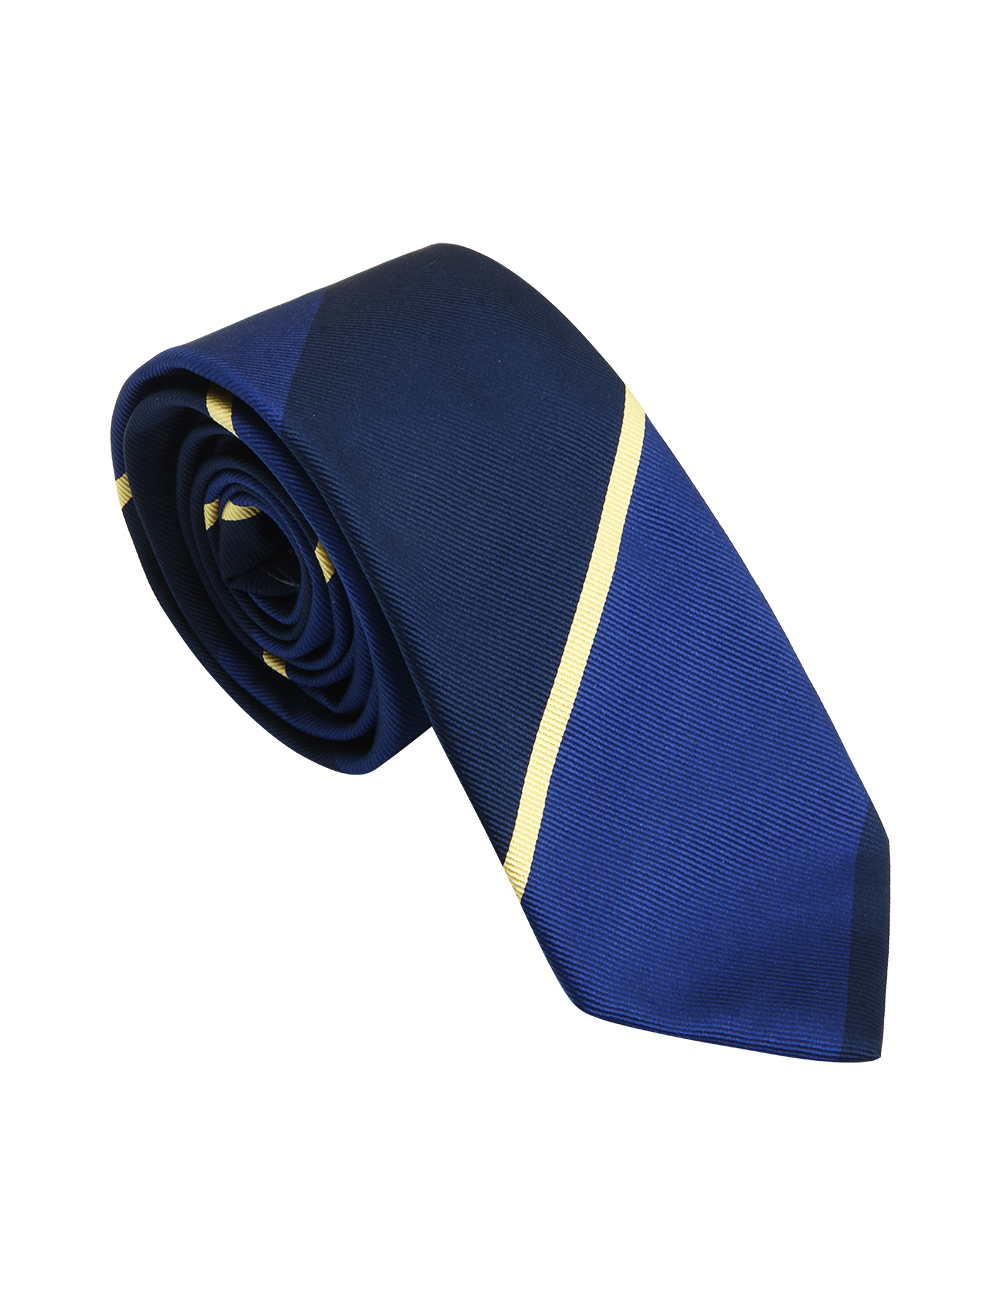 Cravate Club en soie – bleu marine bleu roi jaune   Cadot 9c99b05ddec